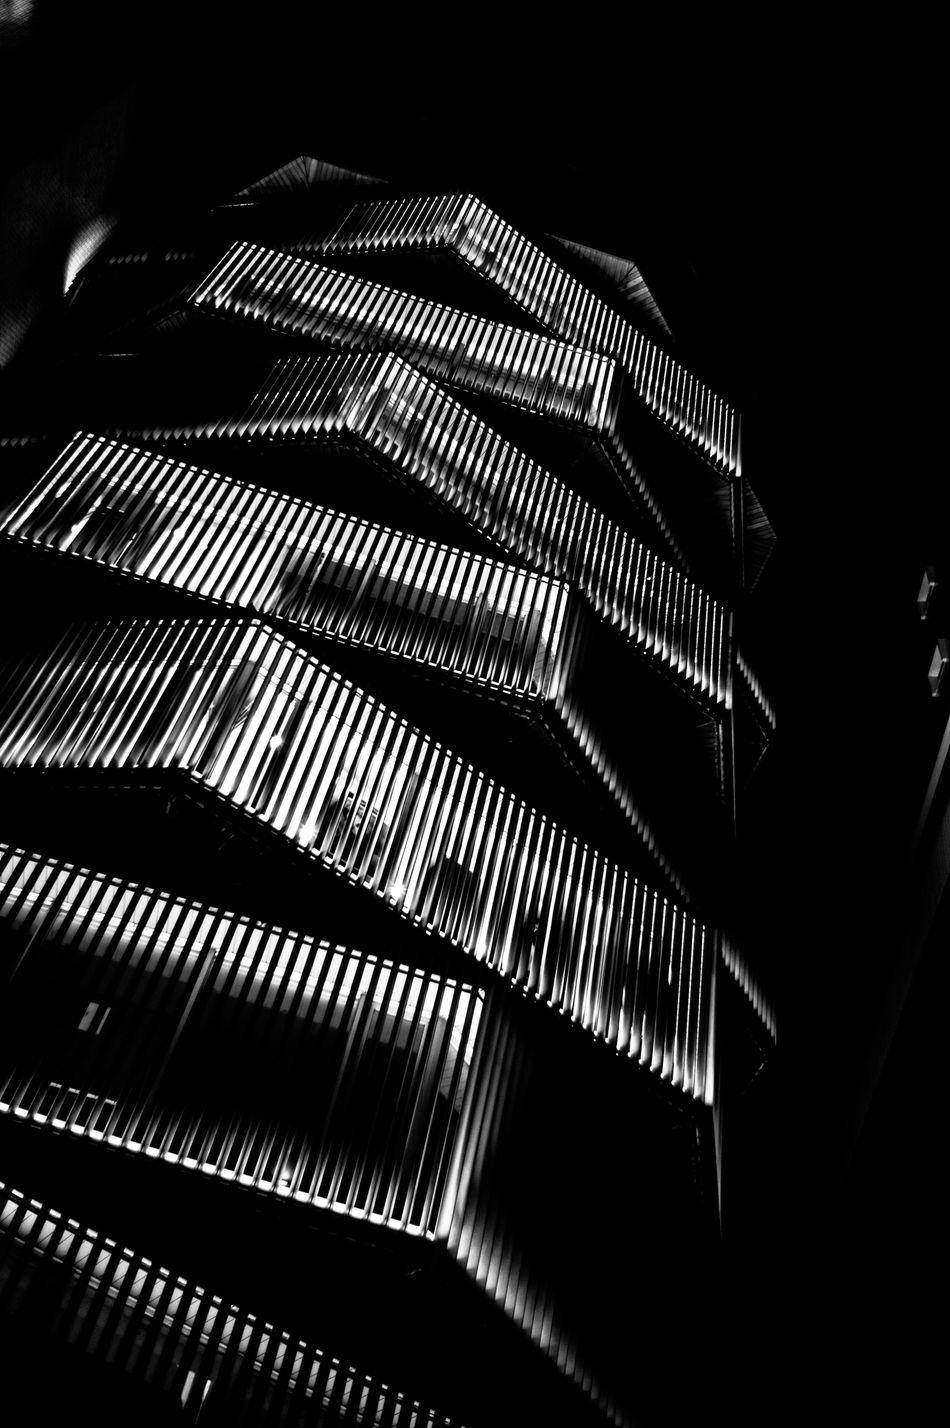 Leicacamera 35mm Tokyo Street Photography Monochrome EyeEm Best Shots Street Photography Blackandwhite Capture The Moment Streetphotography Street Architecture